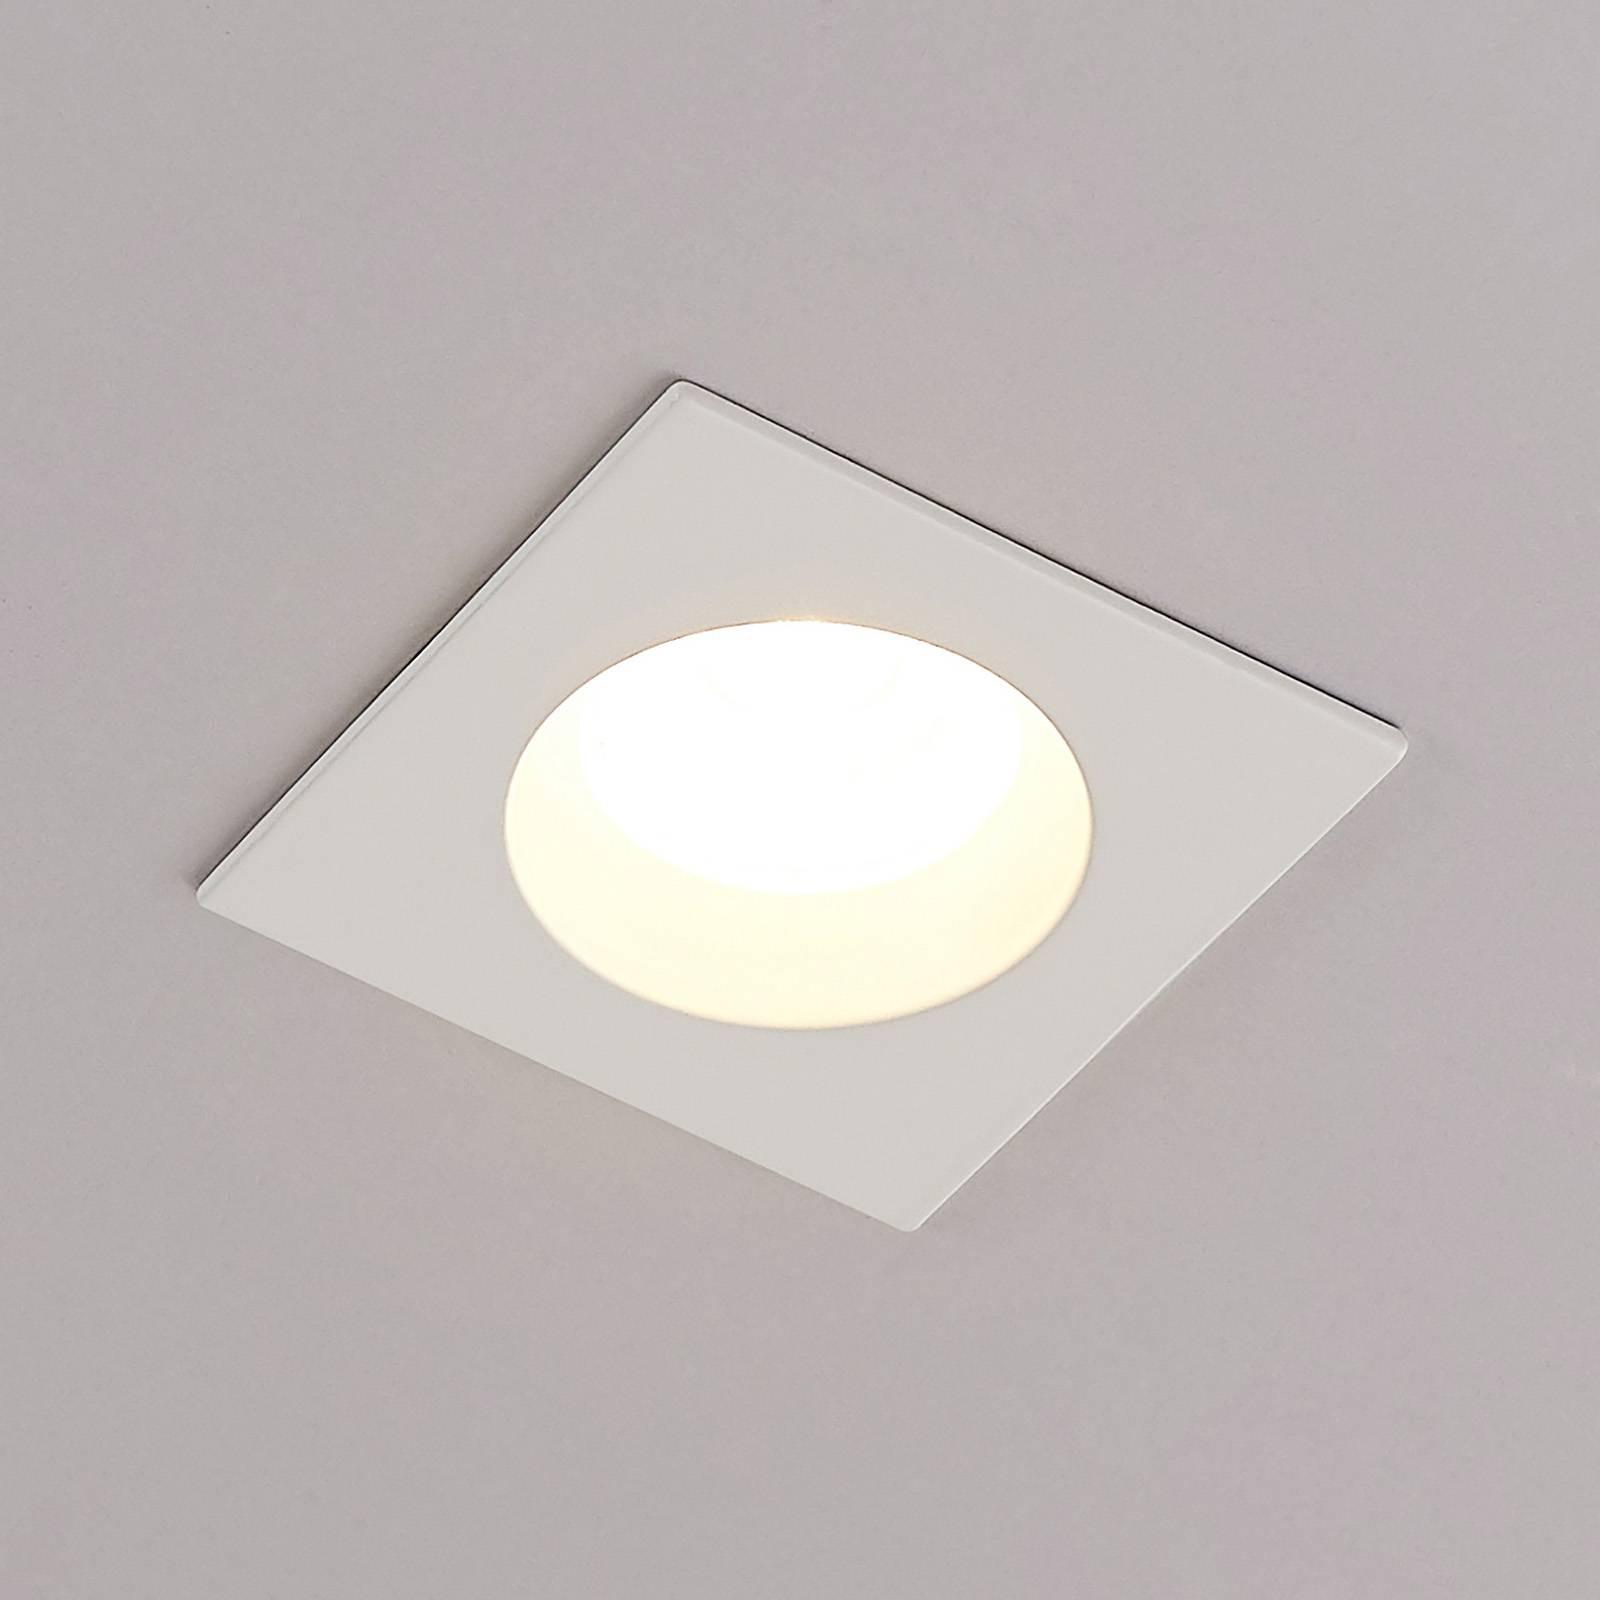 Arcchio Urdin LED-kohdevalo kulmikas IP65, 6,4W